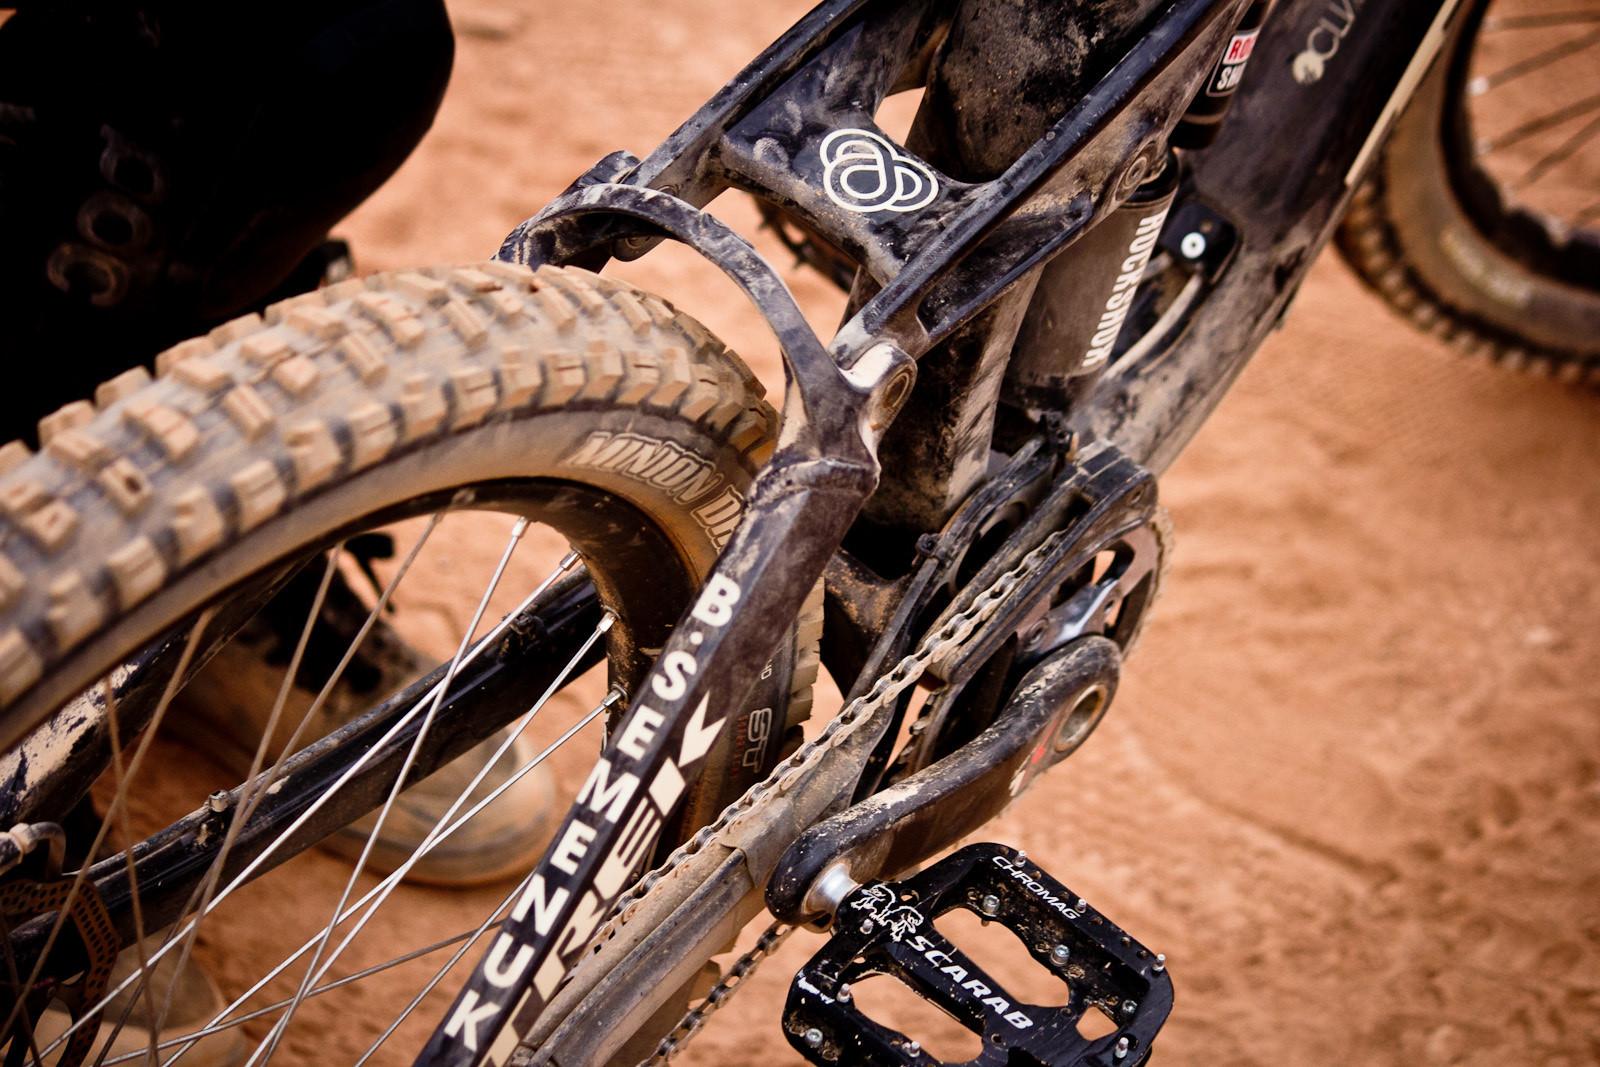 4a816837d11 Semenuk's Trek Session Park for Rampage 2013 - Rampage Pro Bike: Brandon  Semenuk's Trek Session Park - Mountain ...